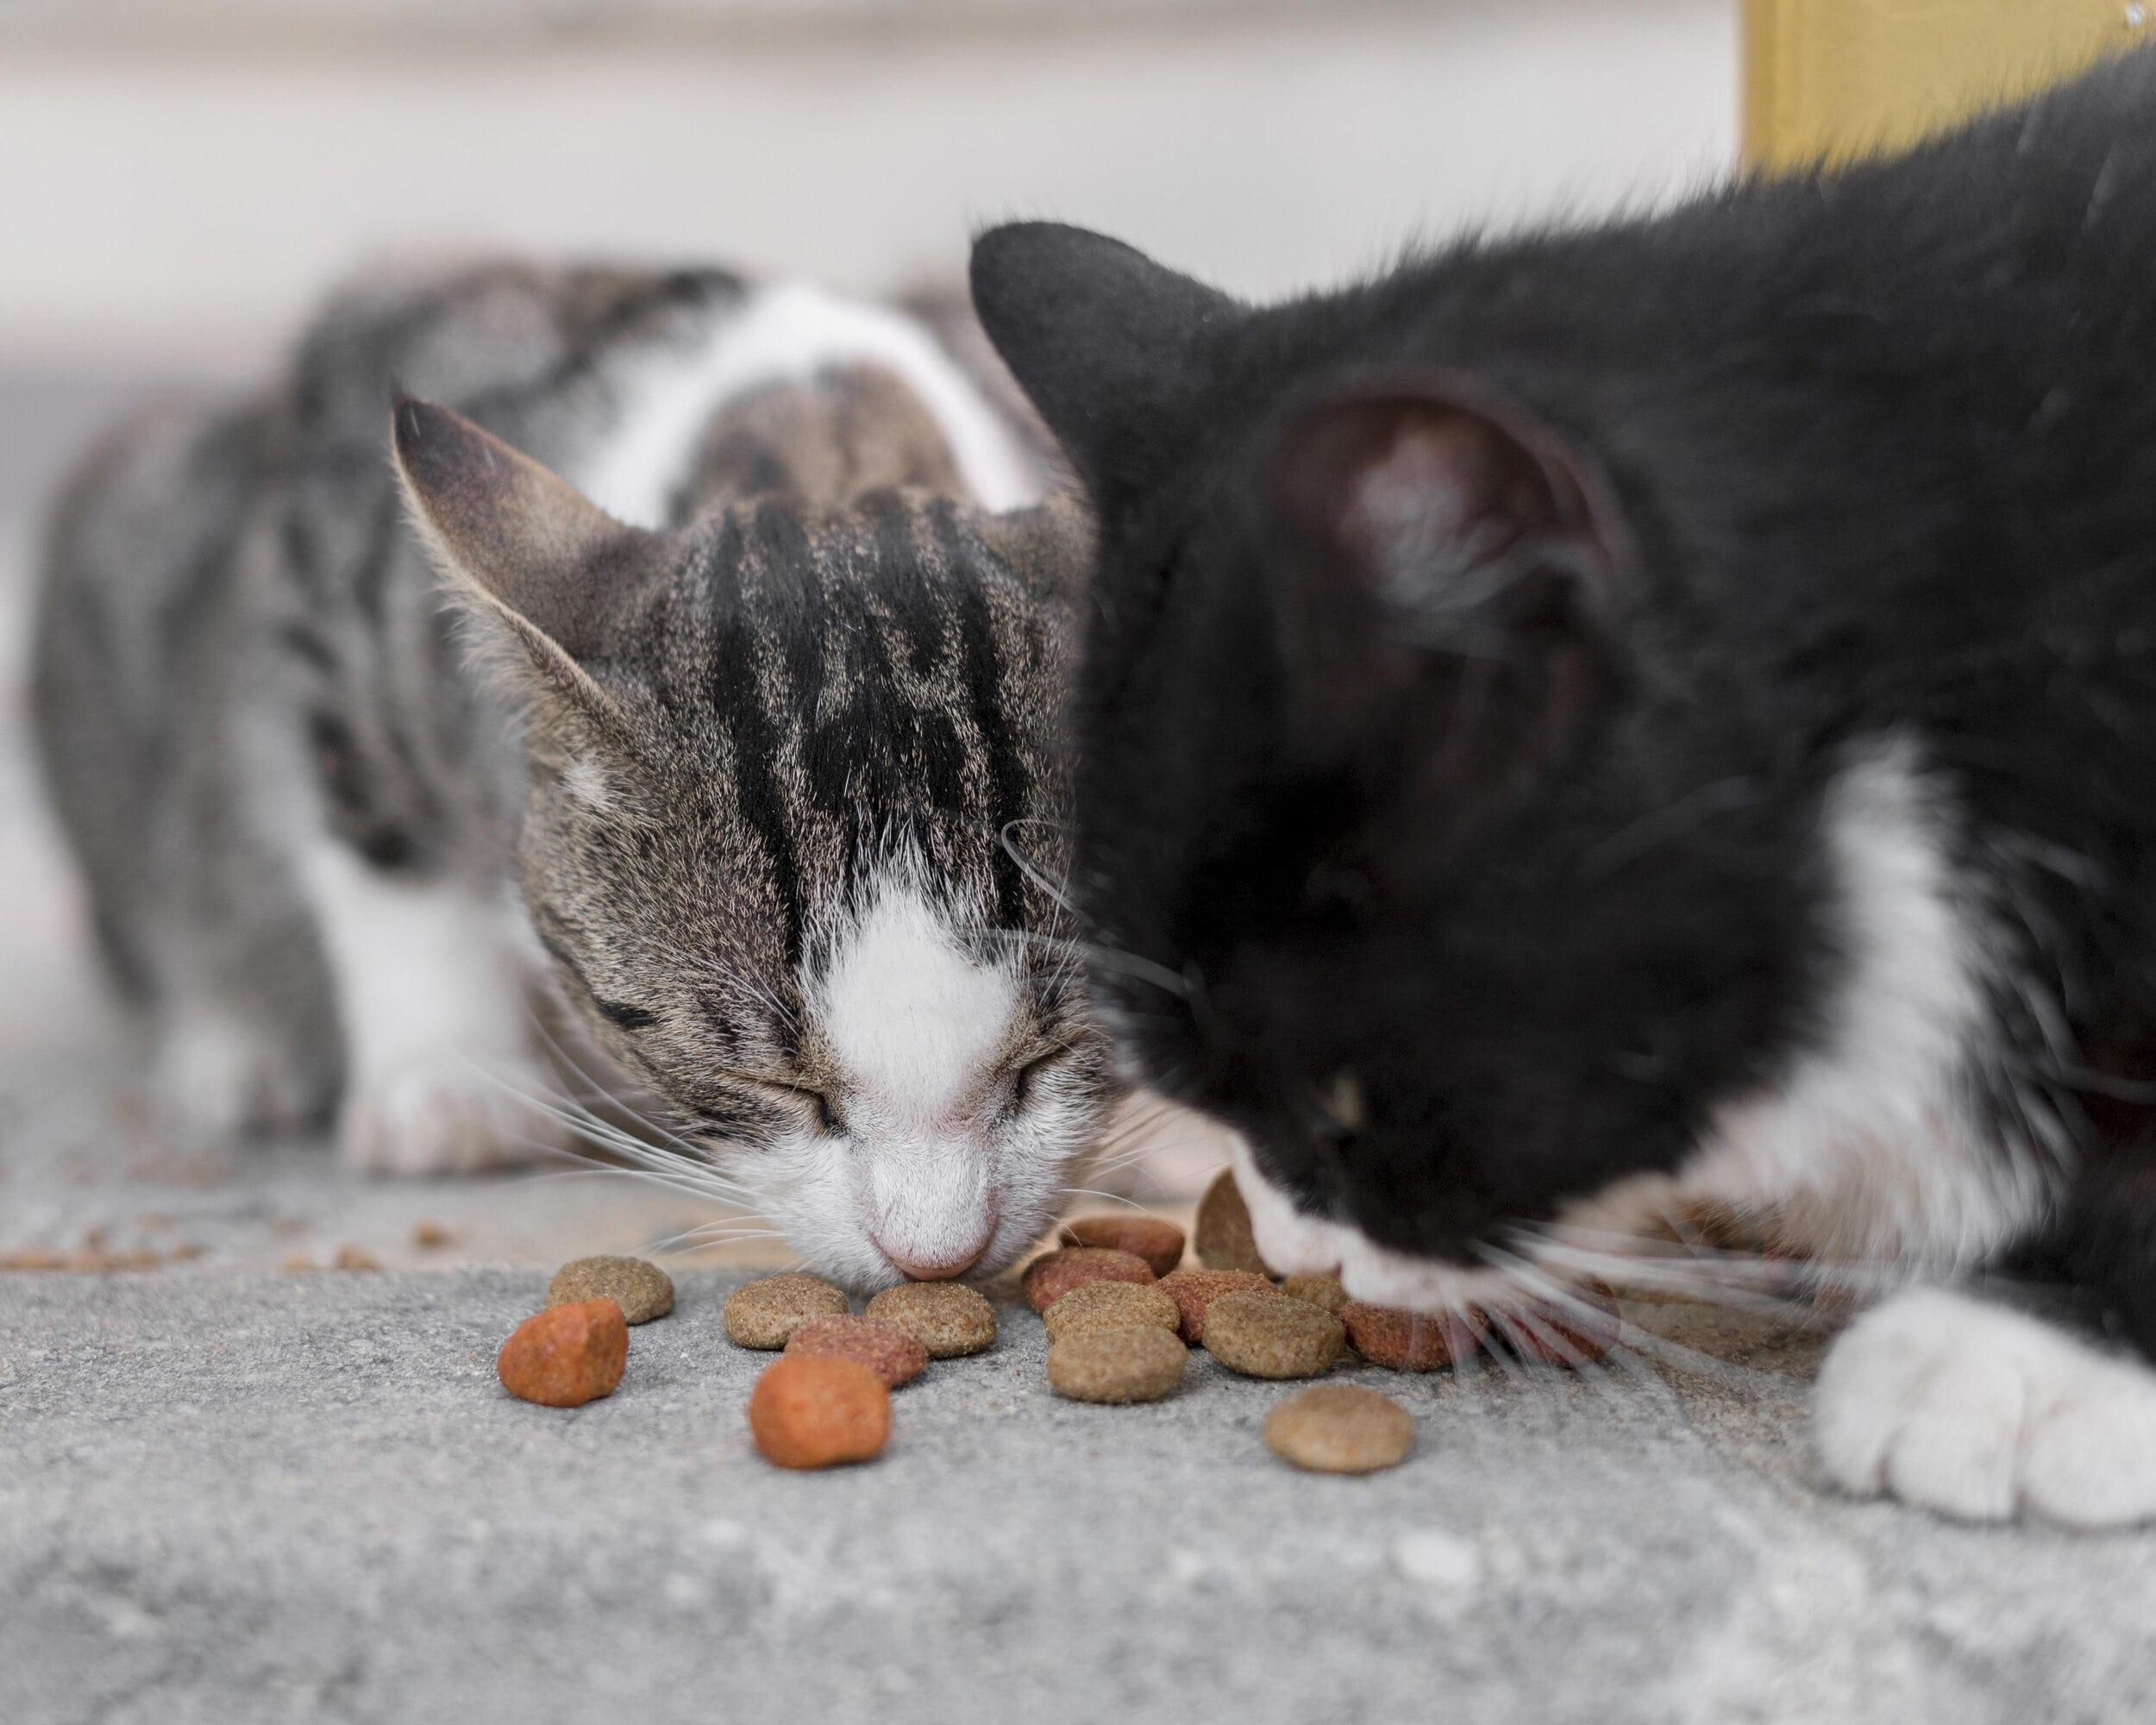 Anorexia en gatos, ¿cómo abordarlo cinicamente?